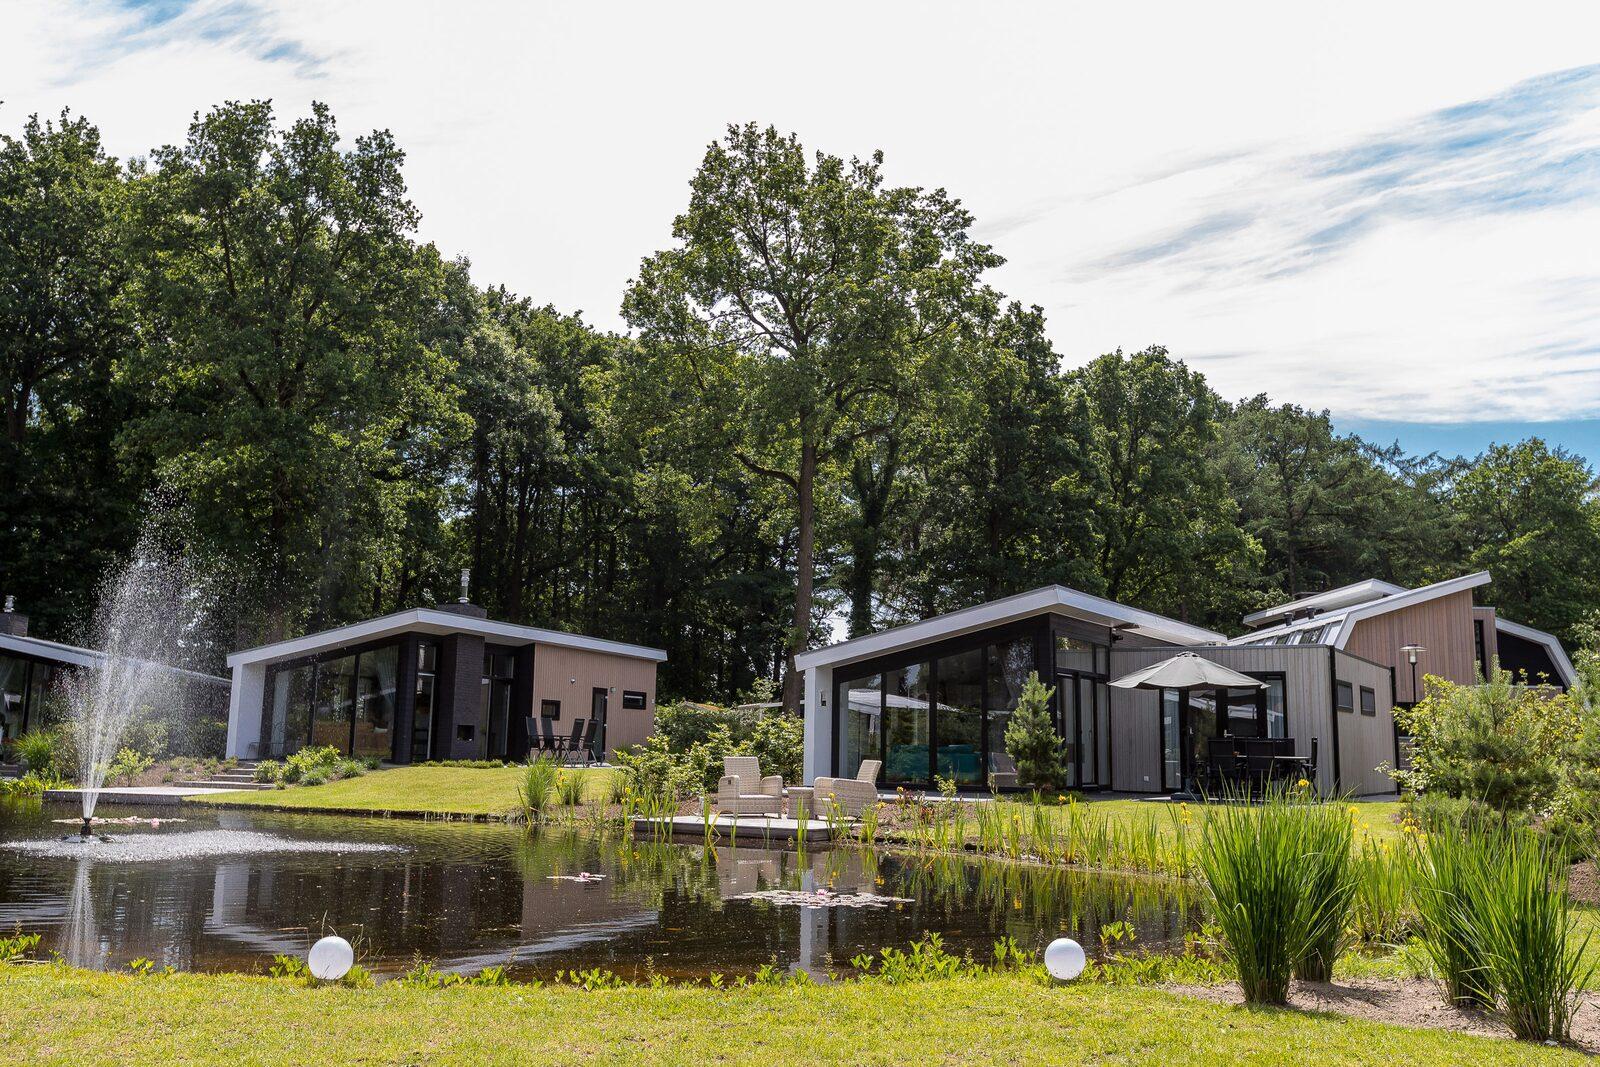 Park Berkenrhode | the Hoge Veluwe